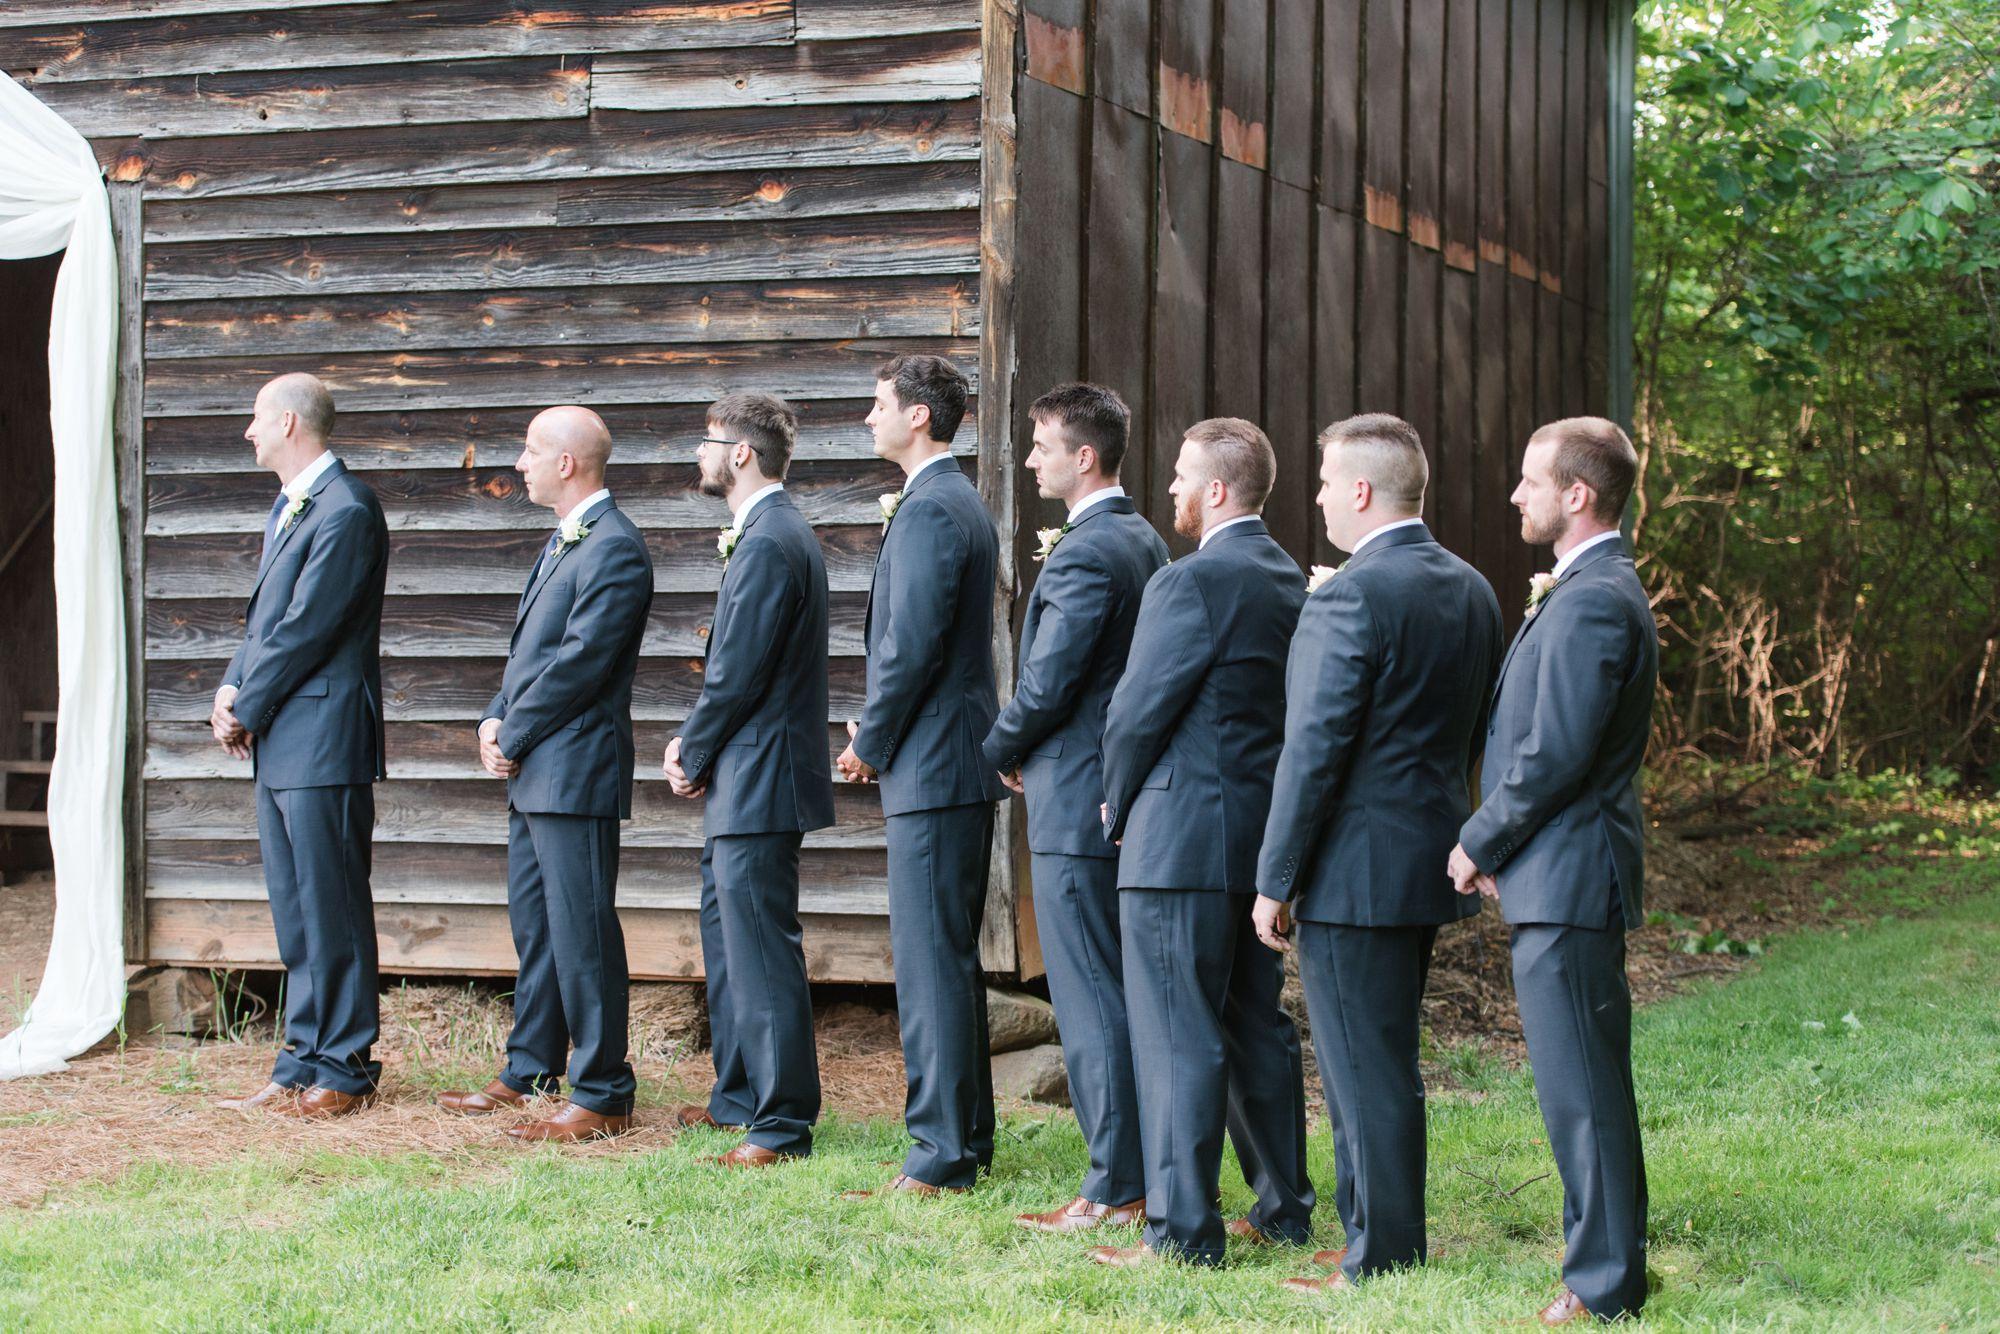 beaver-dam-house-davidson-nc-wedding-photos 53